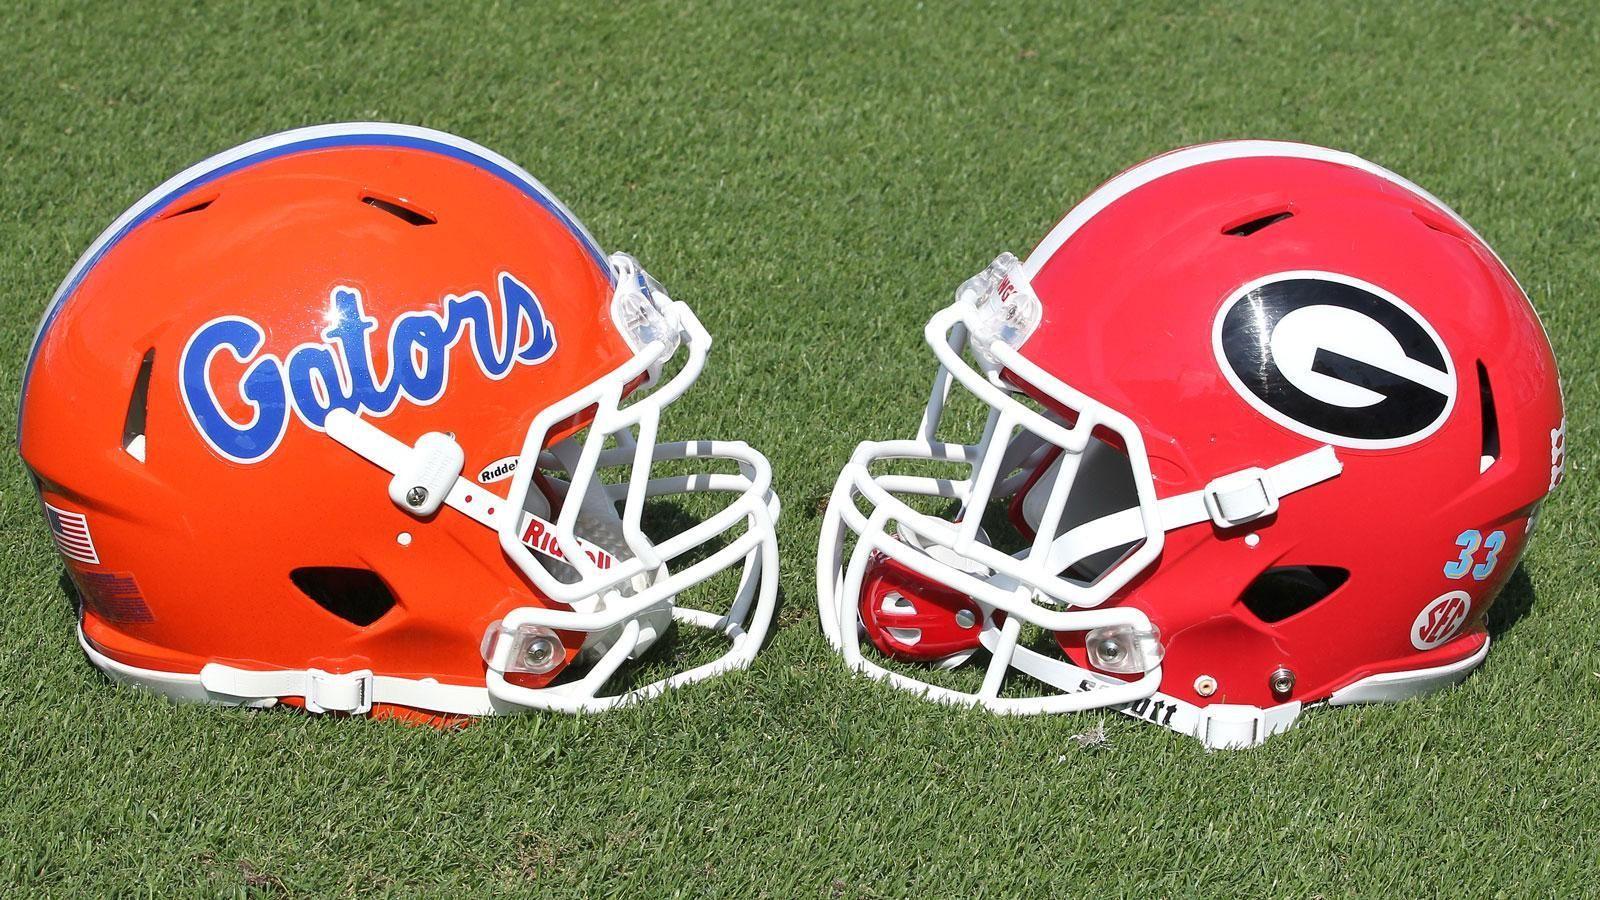 Major SEC East implications in Jacksonville